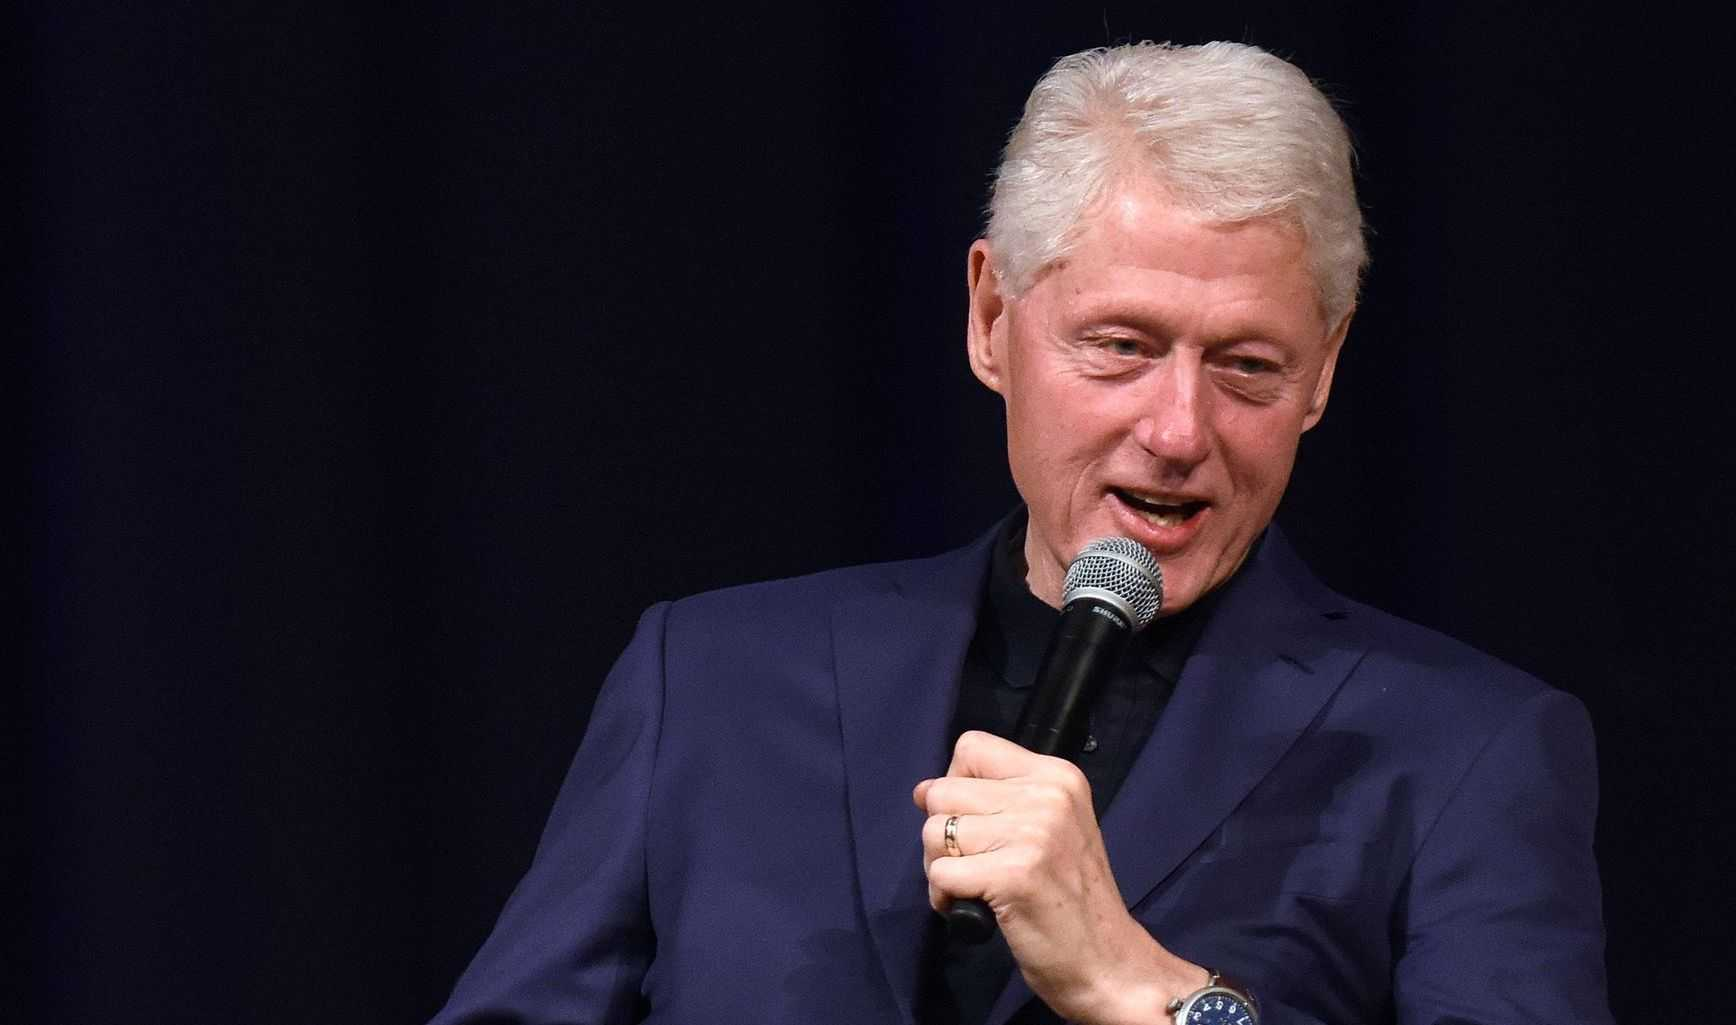 Bill Clinton Net Worth